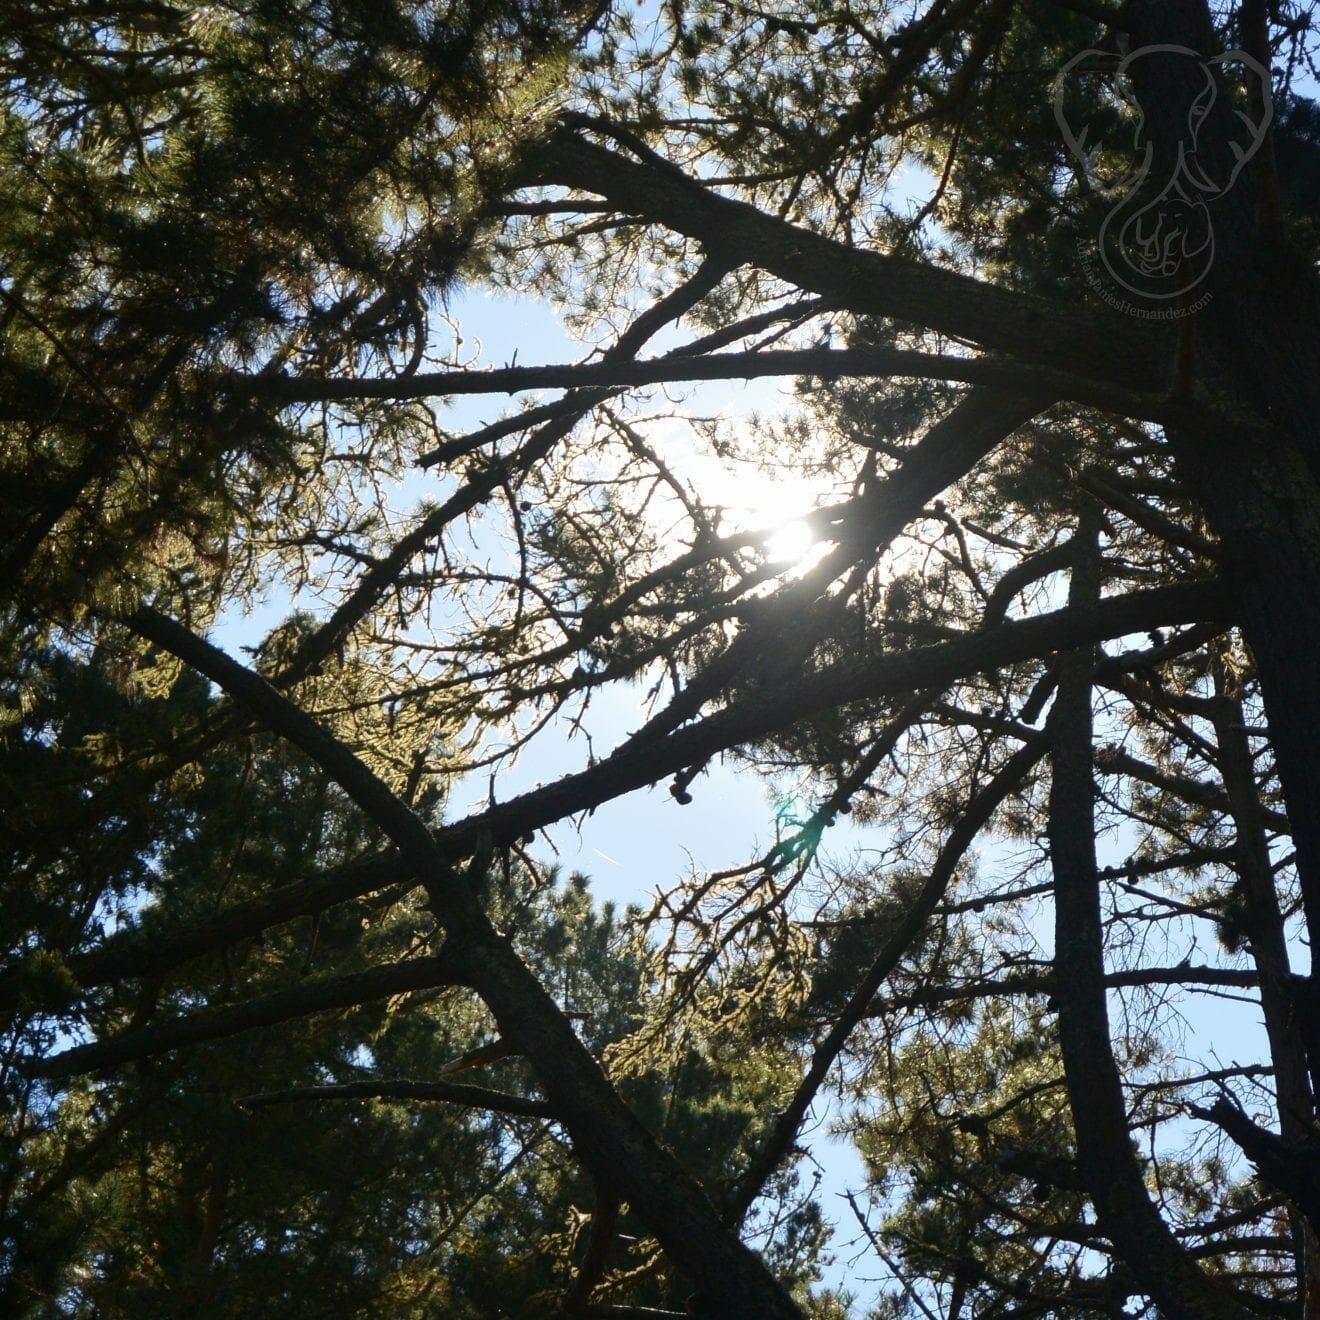 Sunlight through the trees, North Lake Tahoe, California (Miranda Hernandez)